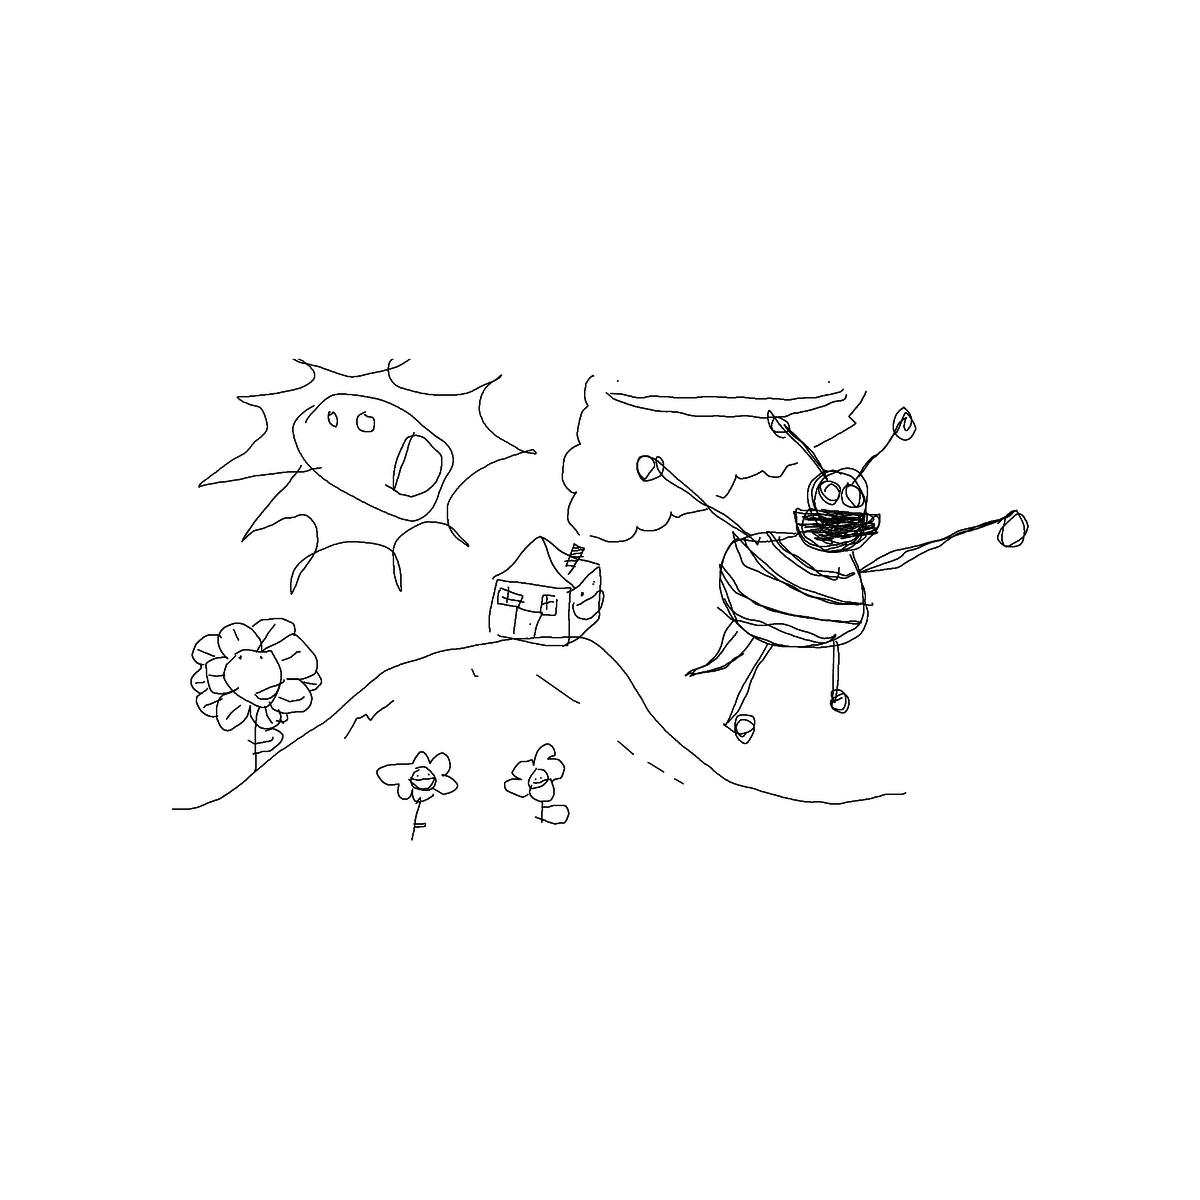 BAAAM drawing#22862 lat:43.3081512451171900lng: 1.4308027029037476